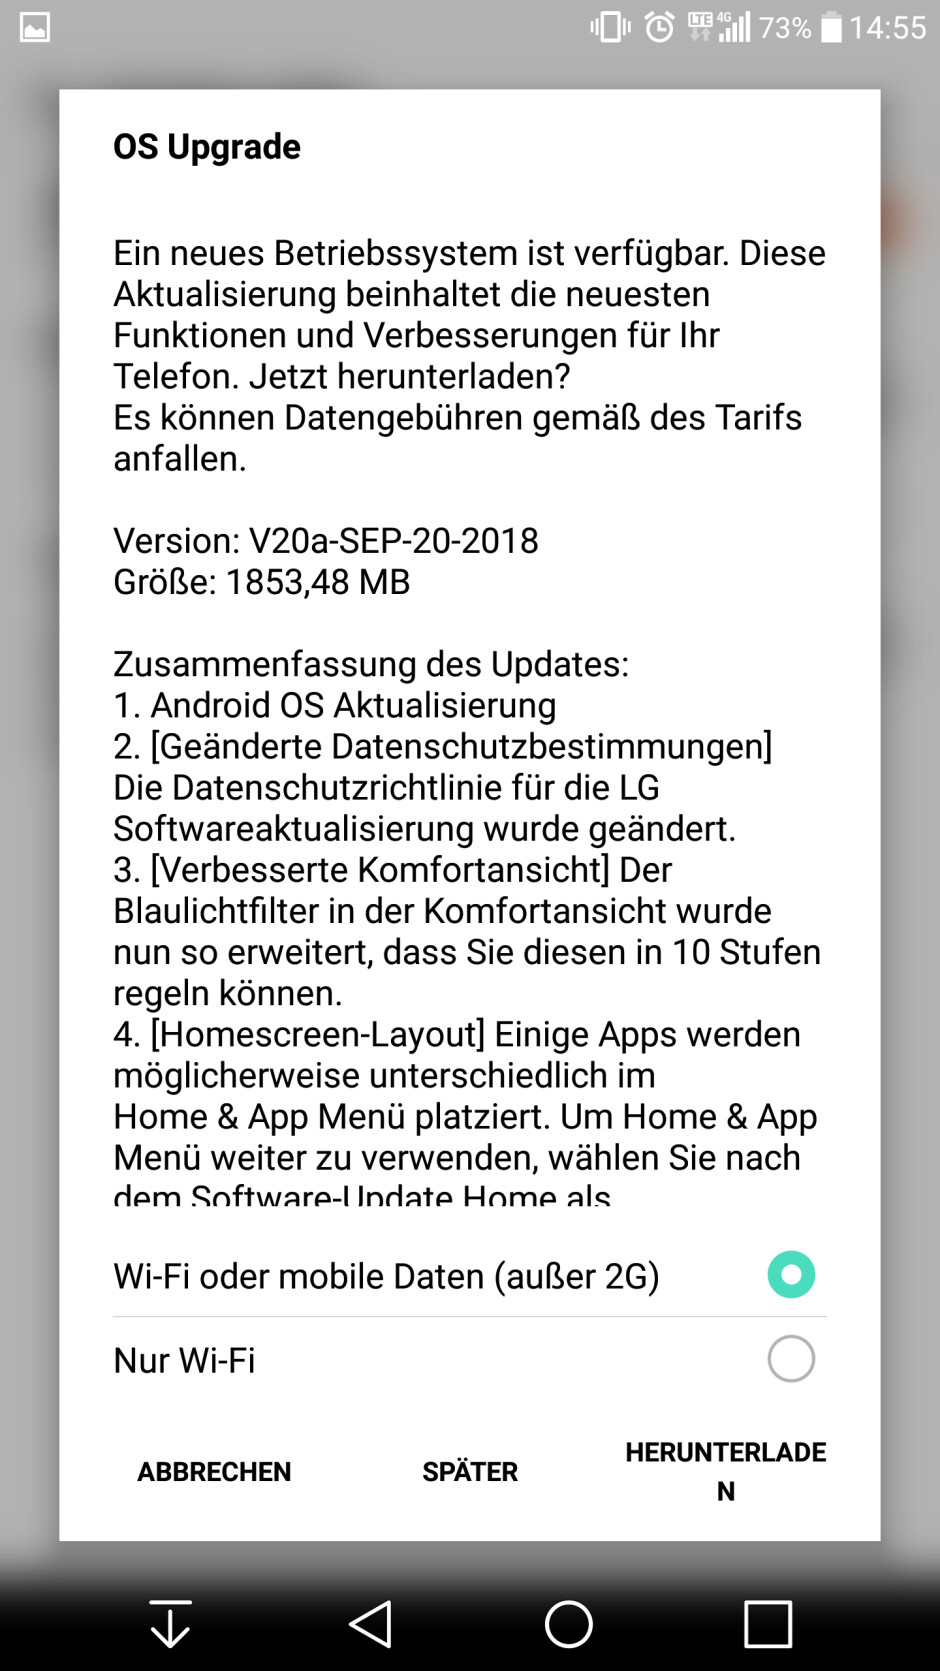 International LG V20 finally receiving Android 8.0 Oreo update